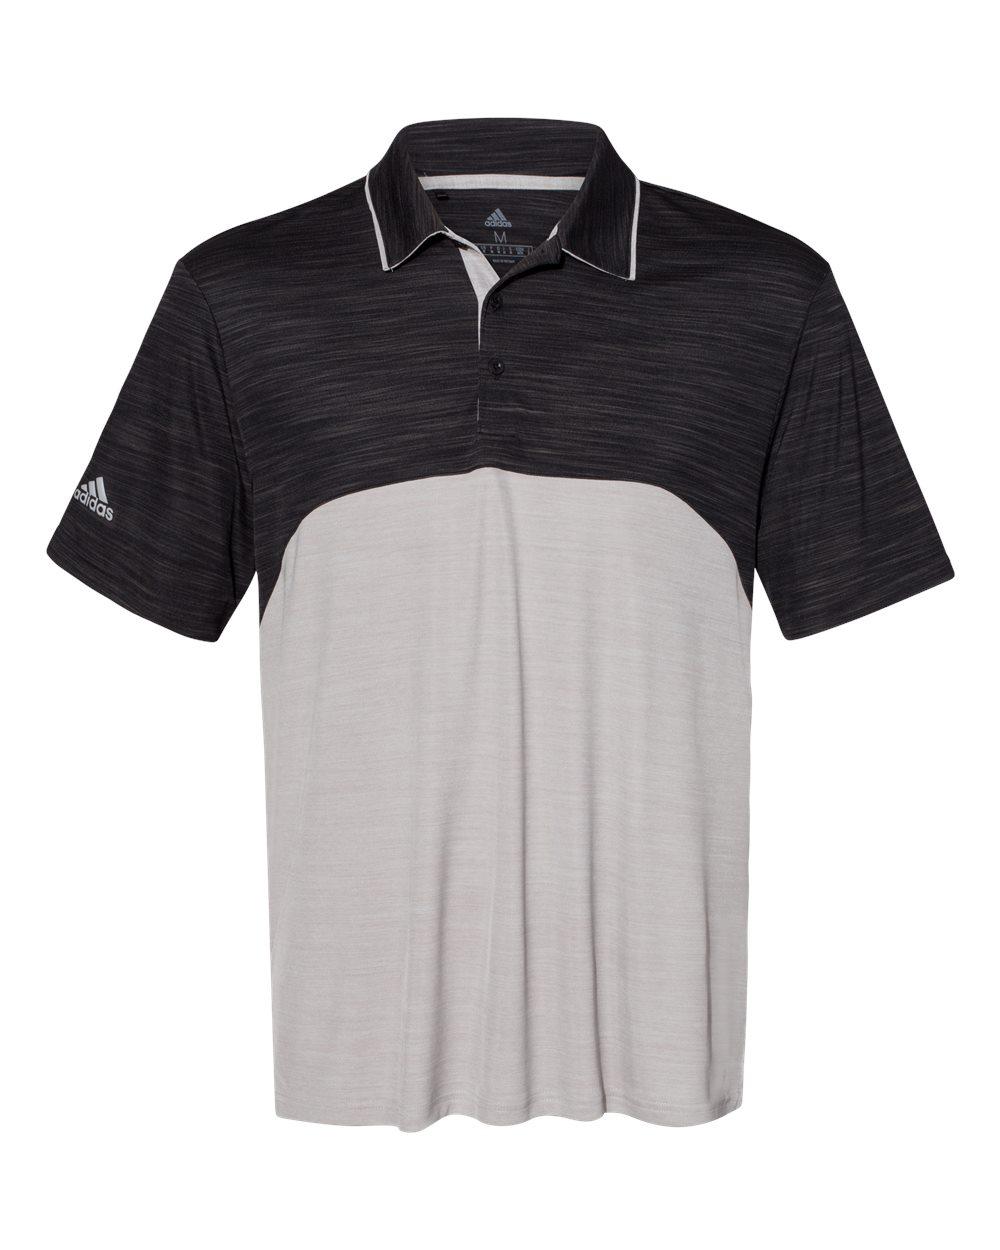 Adidas A404 - Colorblocked Melange Sport Shirt